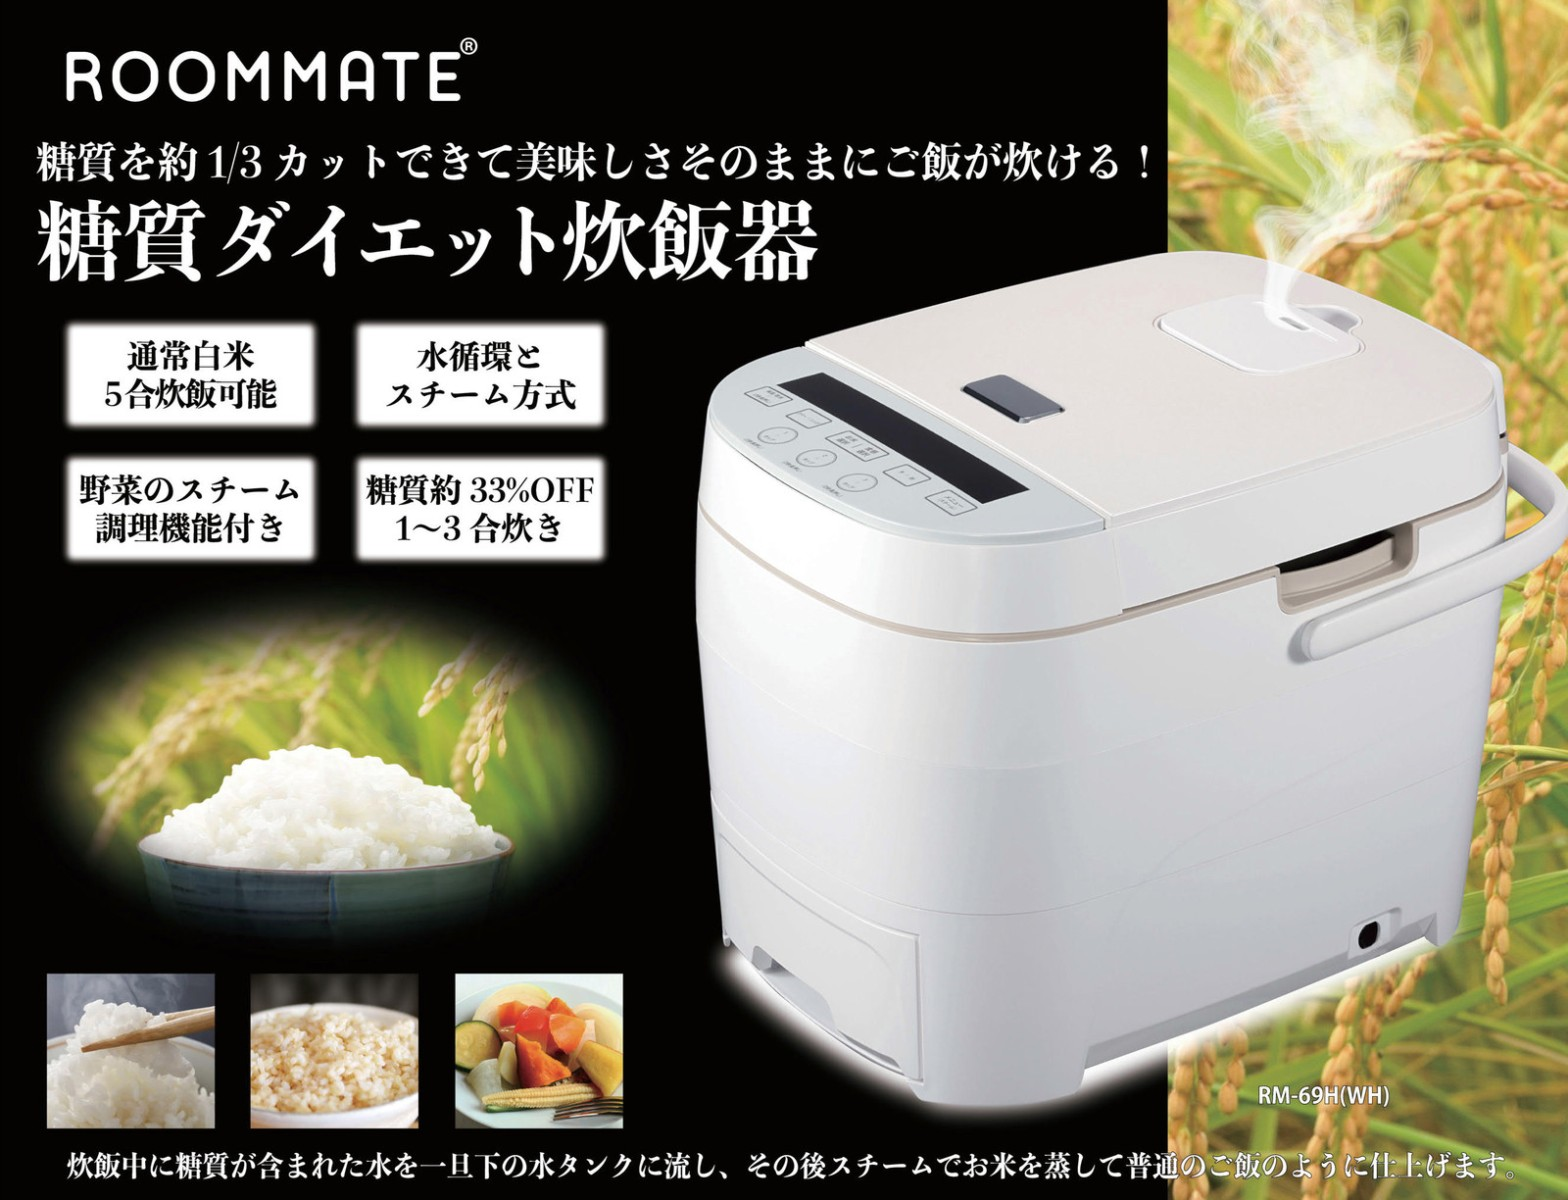 ROOMMATE 糖質ダイエット炊飯器 RM-69H【ROOM】送料無料